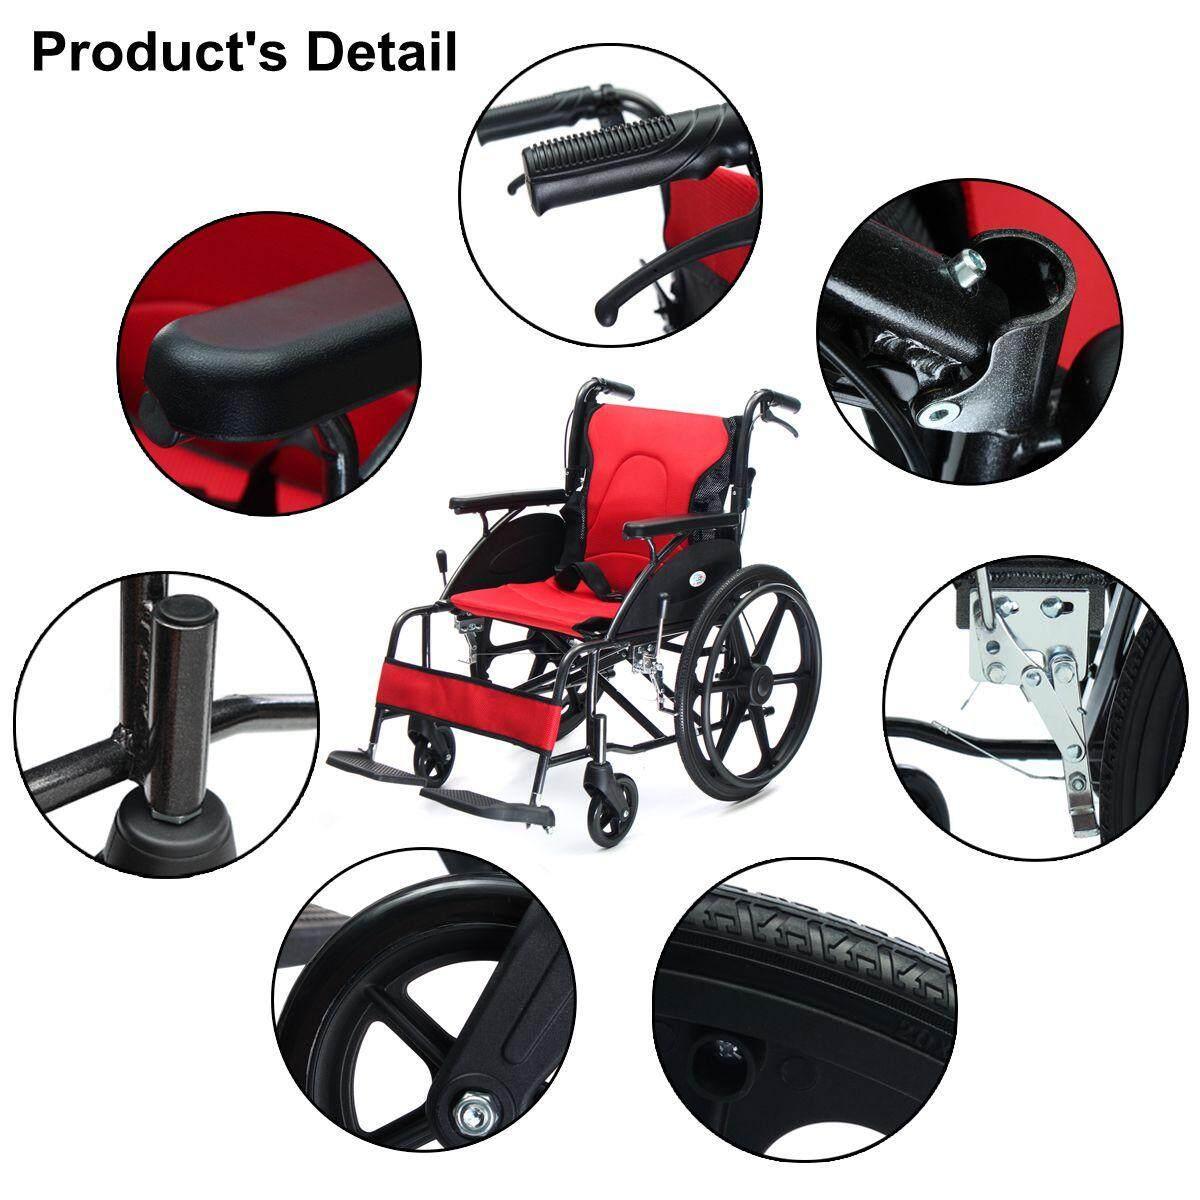 Lipat Aluminium Paduan Kursi Roda Handbrake Berayun Jauh Footrest Perangkat Mobilitas-Internasional